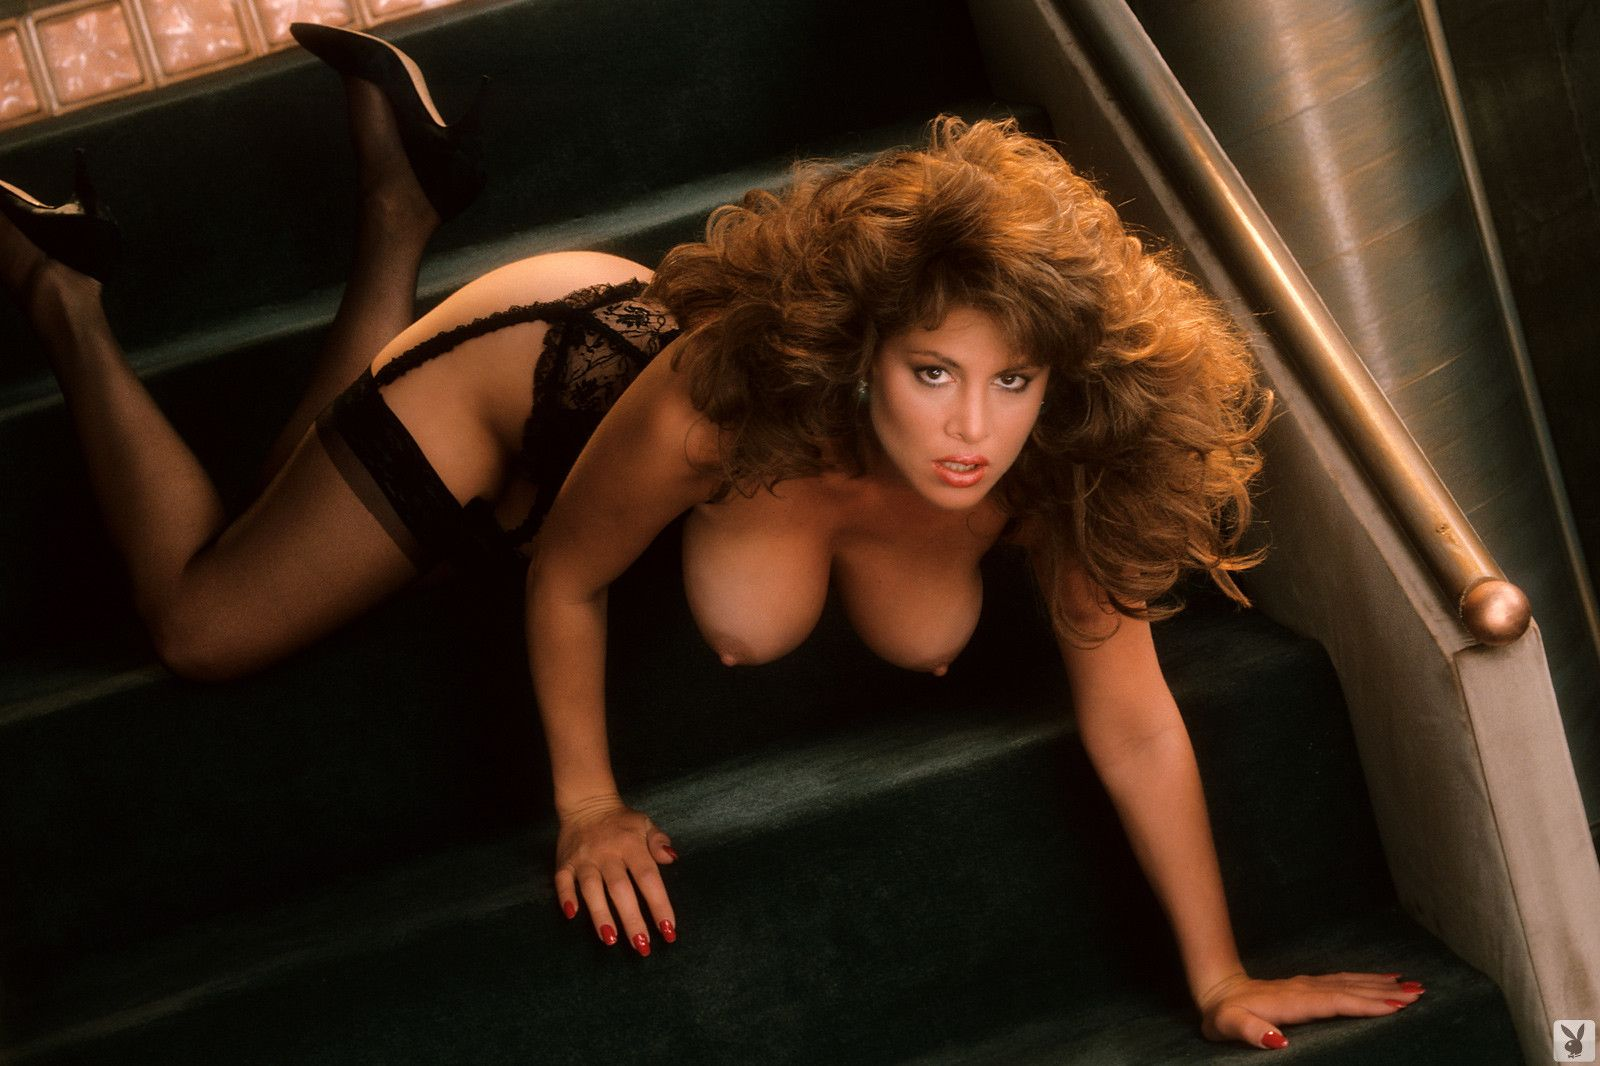 Short thick curvy black girl nude